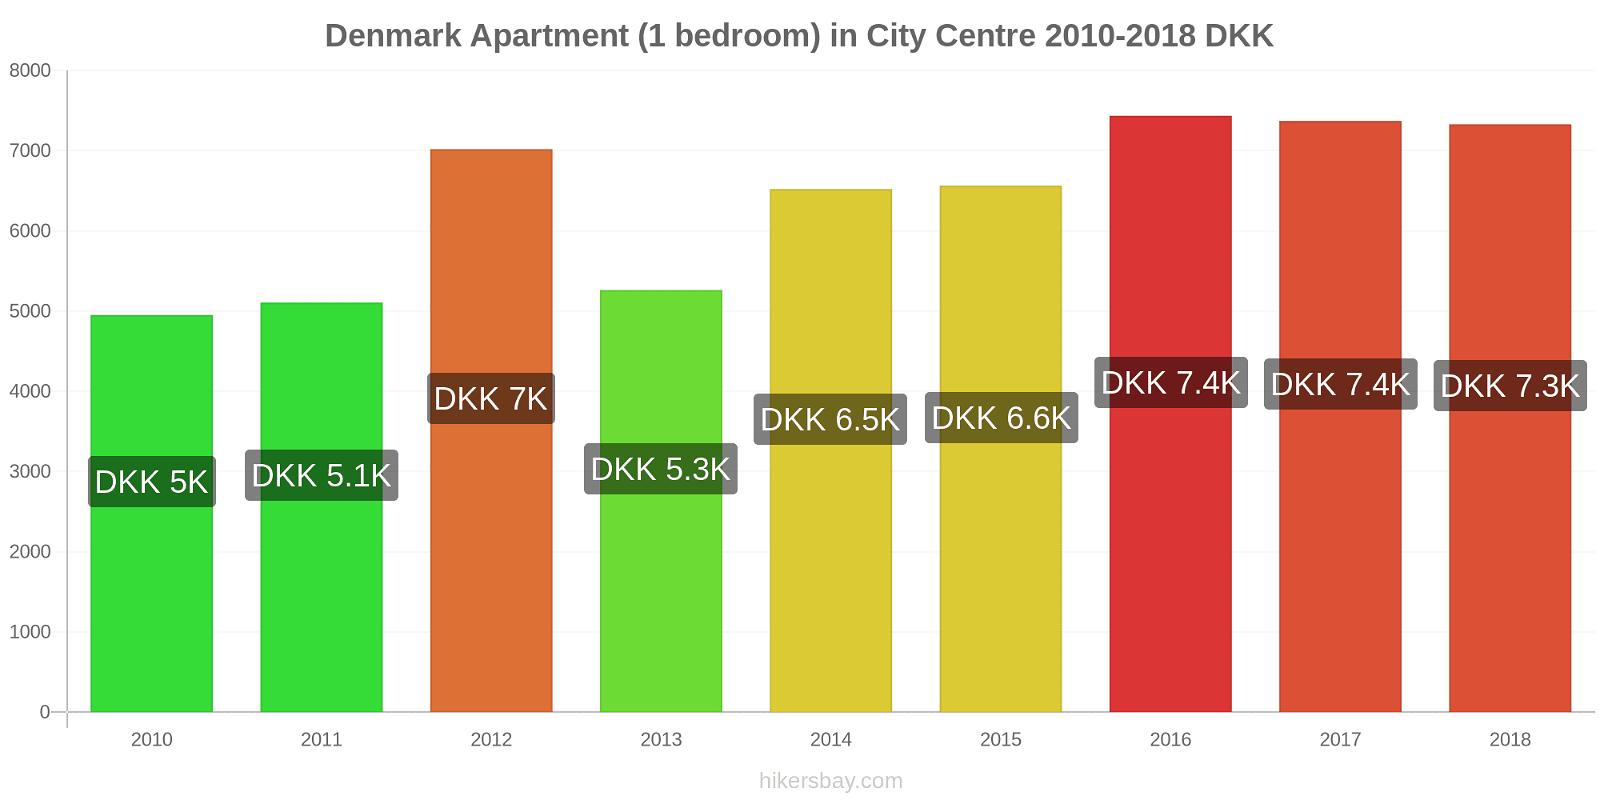 Denmark price changes Apartment (1 bedroom) in City Centre hikersbay.com